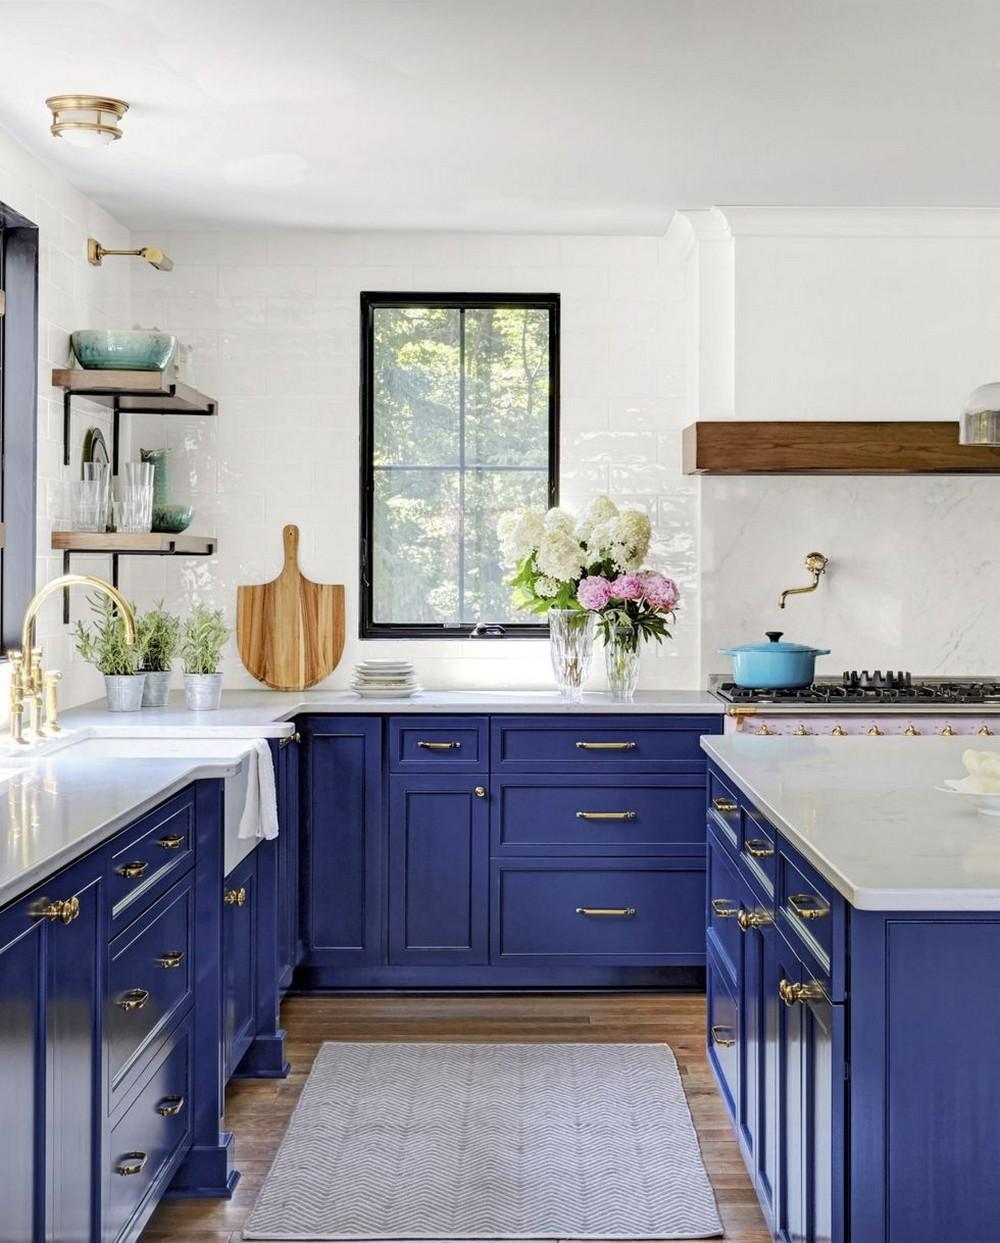 Kitchen Design 6 Exquisite Color Schemes to Complement Your Interior_4 kitchen design Kitchen Design: 6 Exquisite Color Schemes to Complement Your Interior Kitchen Design 6 Exquisite Color Schemes to Complement Your Interior 4